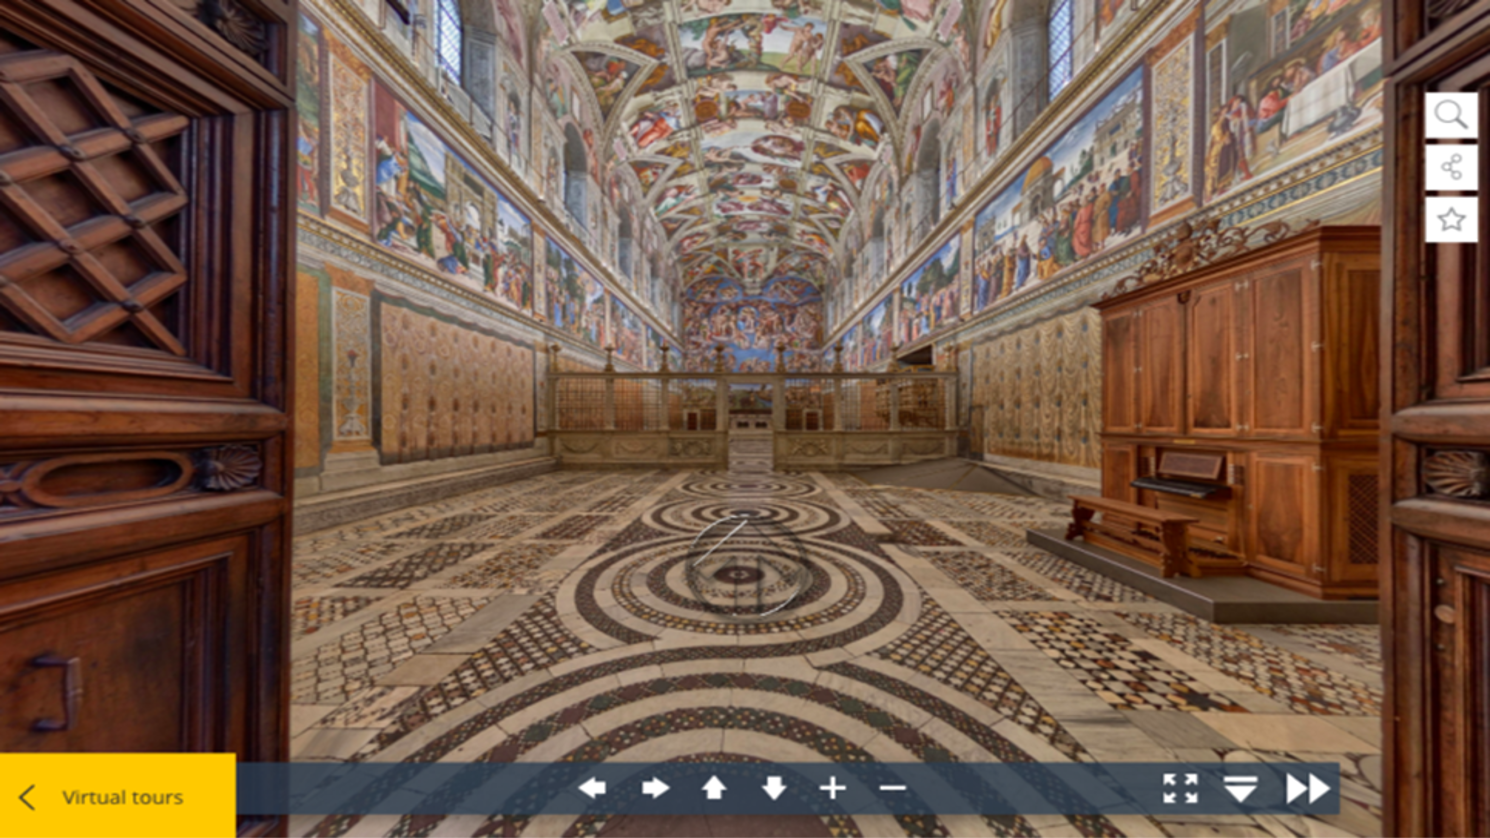 The Sistine Chapel explored through the Vatican's virtual portal / ©museivaticani.va